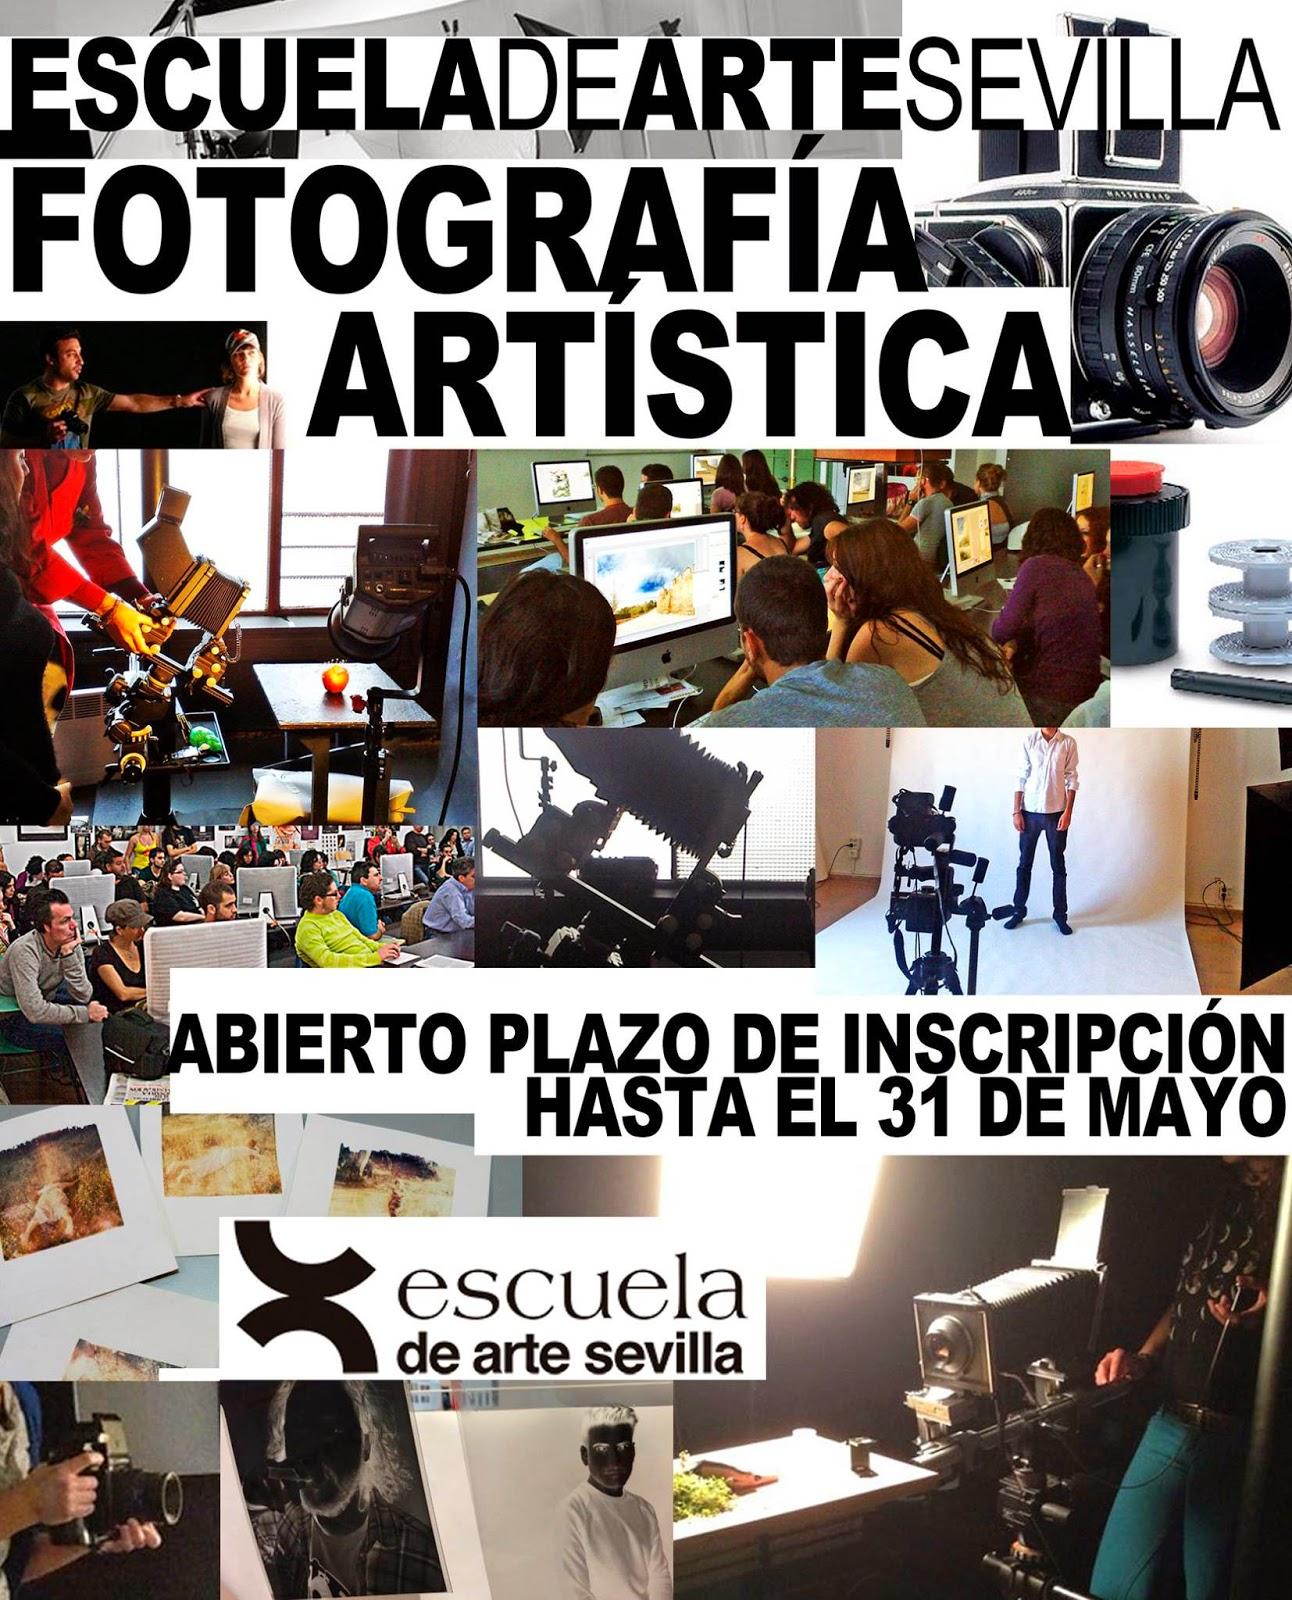 http://www.escueladeartedesevilla.es/